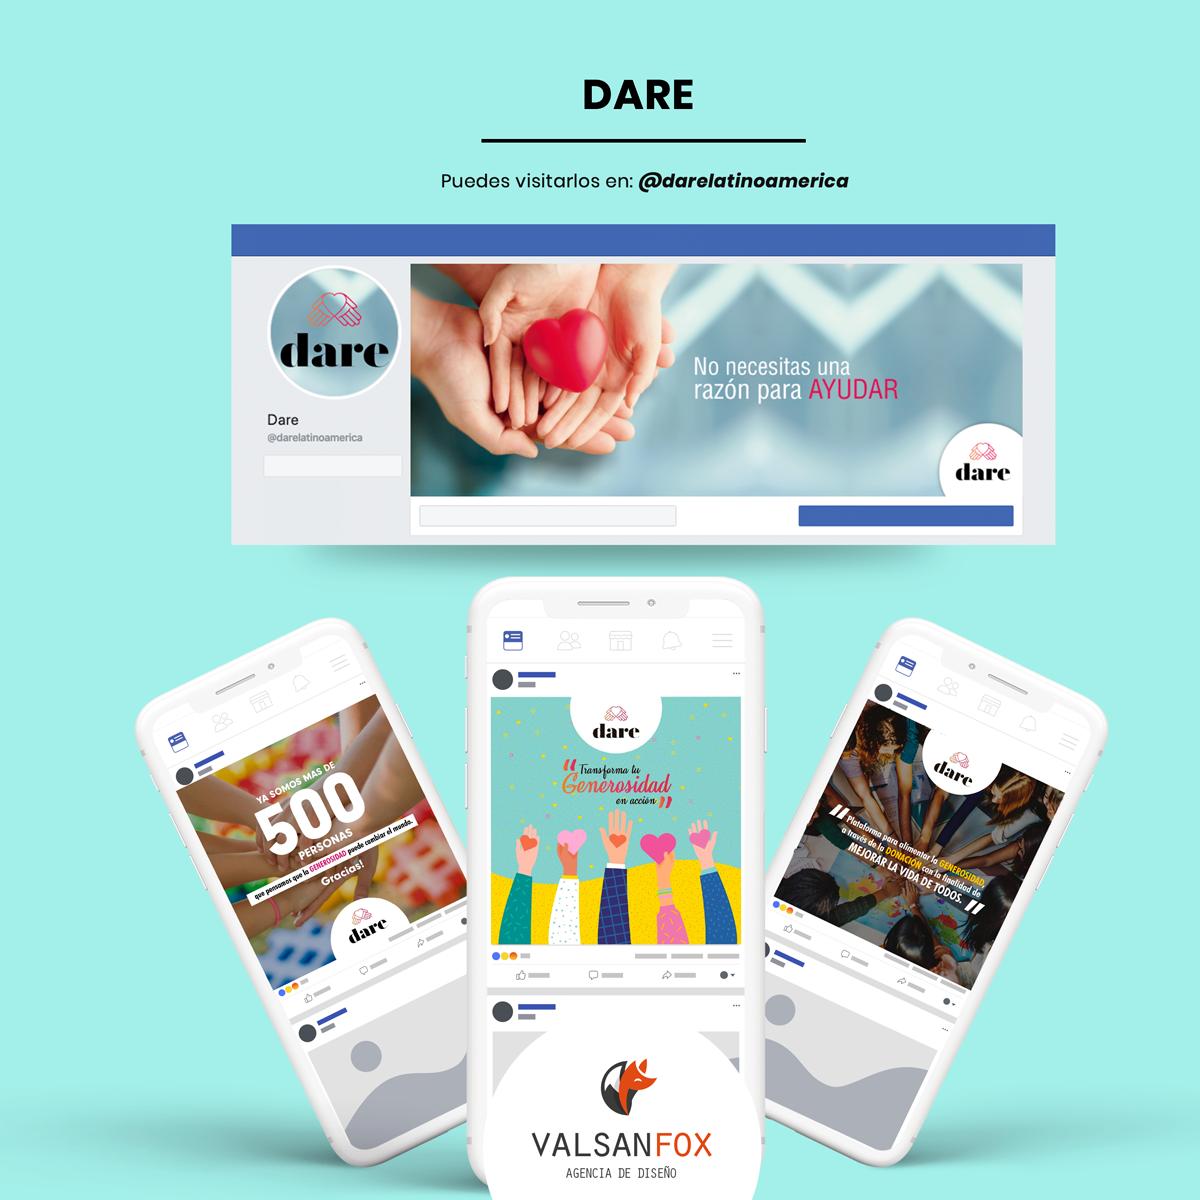 Dare-redes sociales-valsanfox